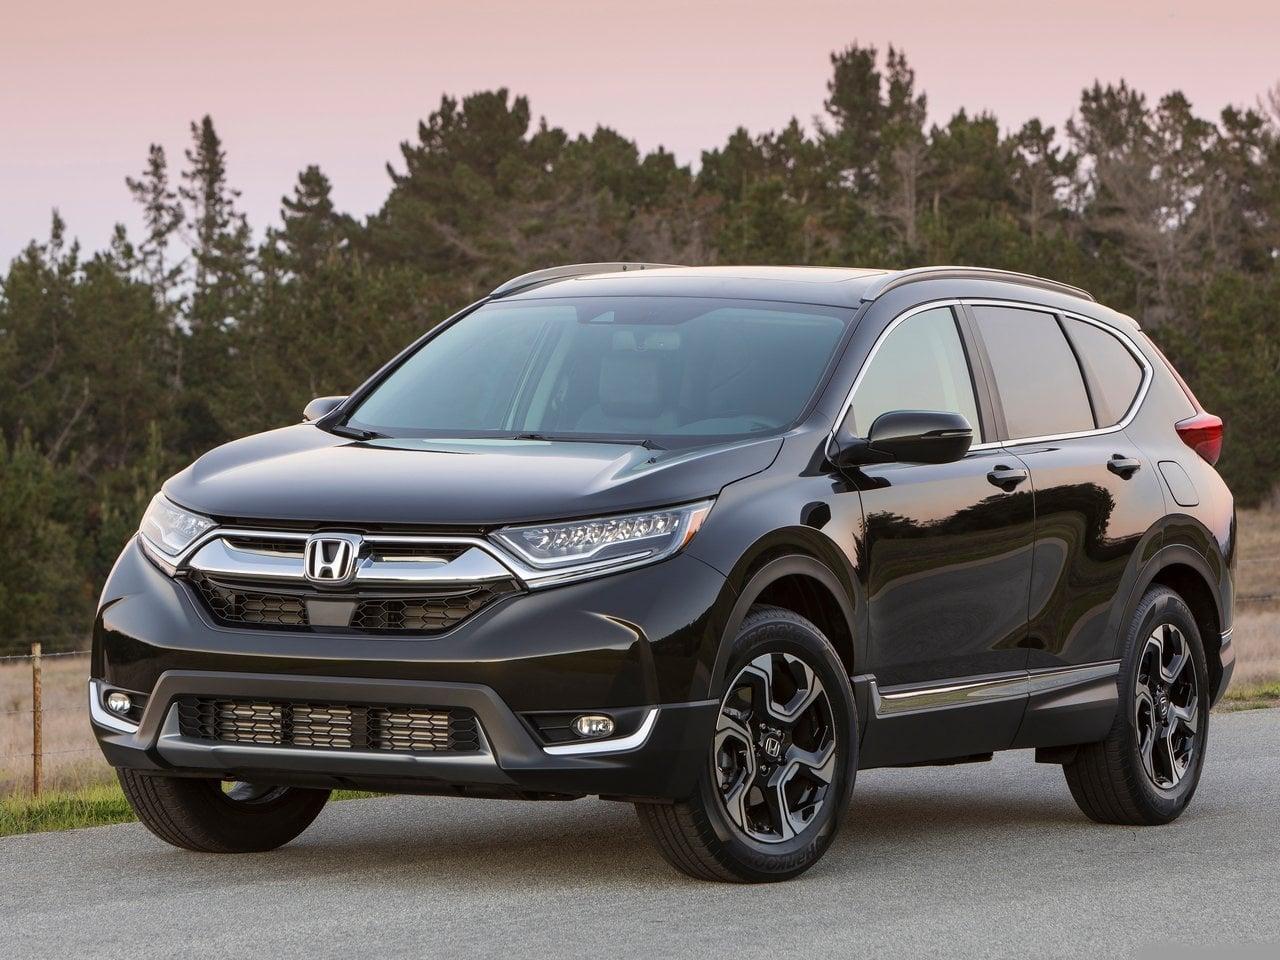 New Honda CRV 7 Seater SUV is India-bound!